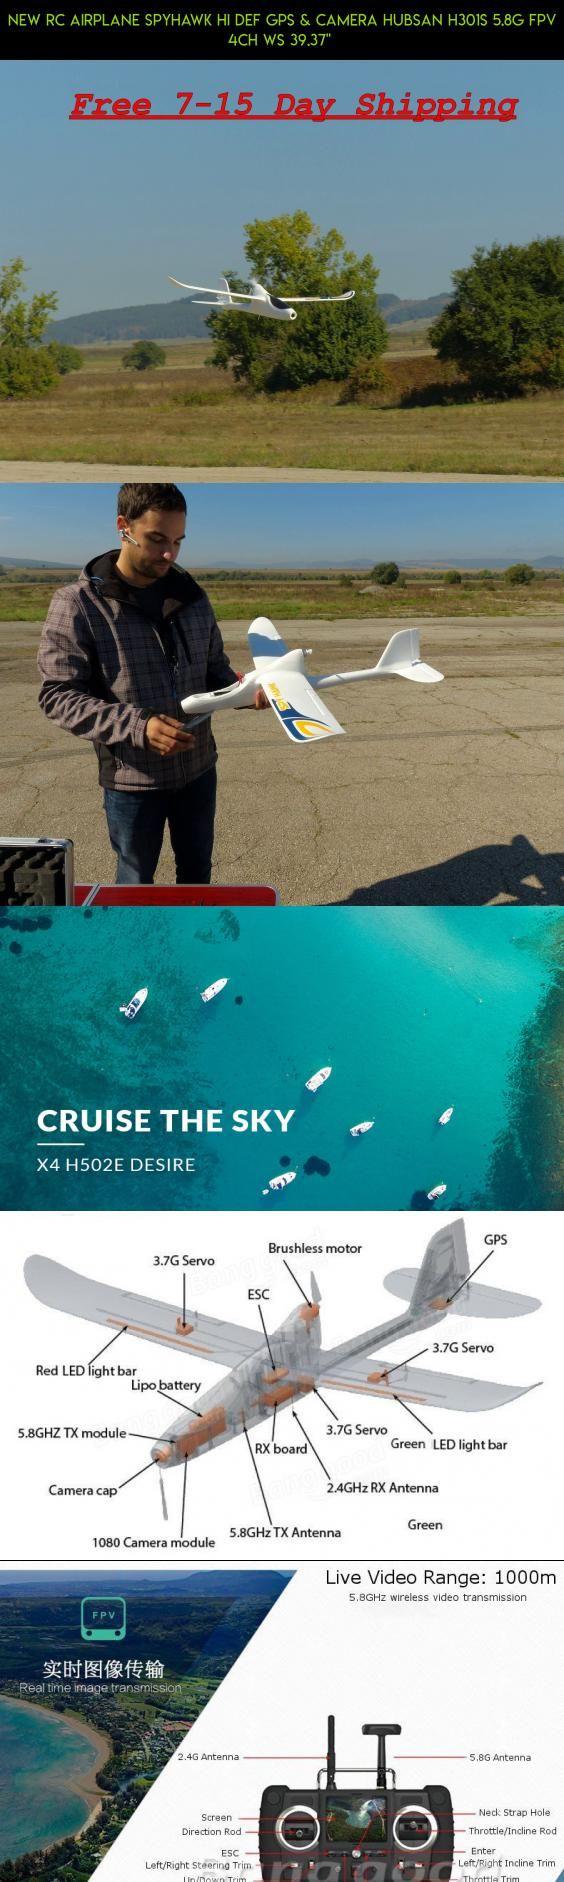 "NEW RC AIRPLANE SPYHAWK HI DEF GPS & CAMERA HUBSAN H301S 5.8G FPV 4CH WS 39.37""  #spyhawk #tech #shopping #plans #racing #drone #gadgets #hubsan #fpv #camera #technology #products #kit #parts"